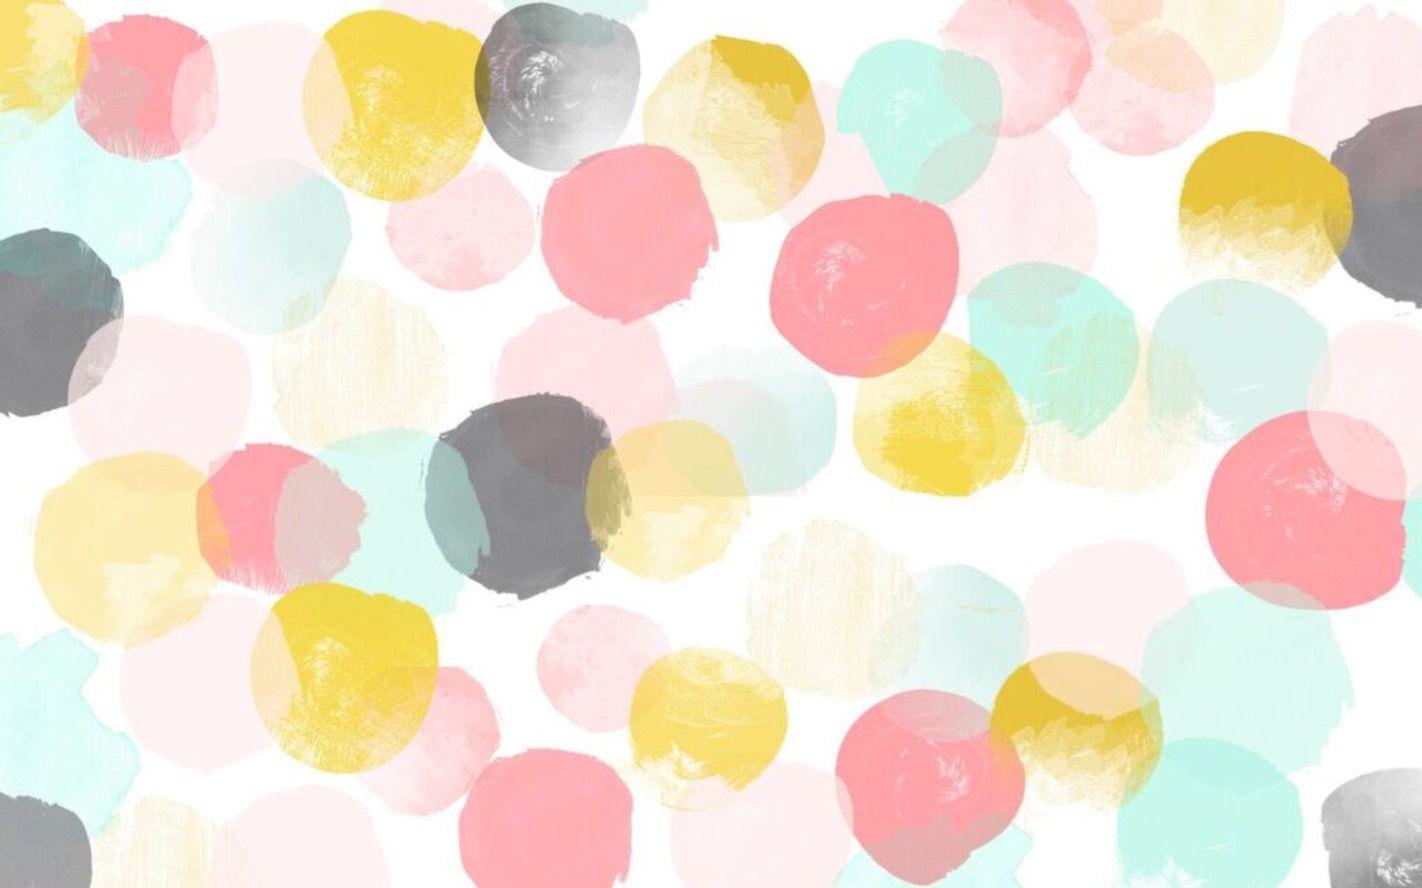 Wallpaper #wallpaper #marieghansen | ~Wallpapers~ | Pinterest ... | Artsy in 2019 | Pc desktop ...